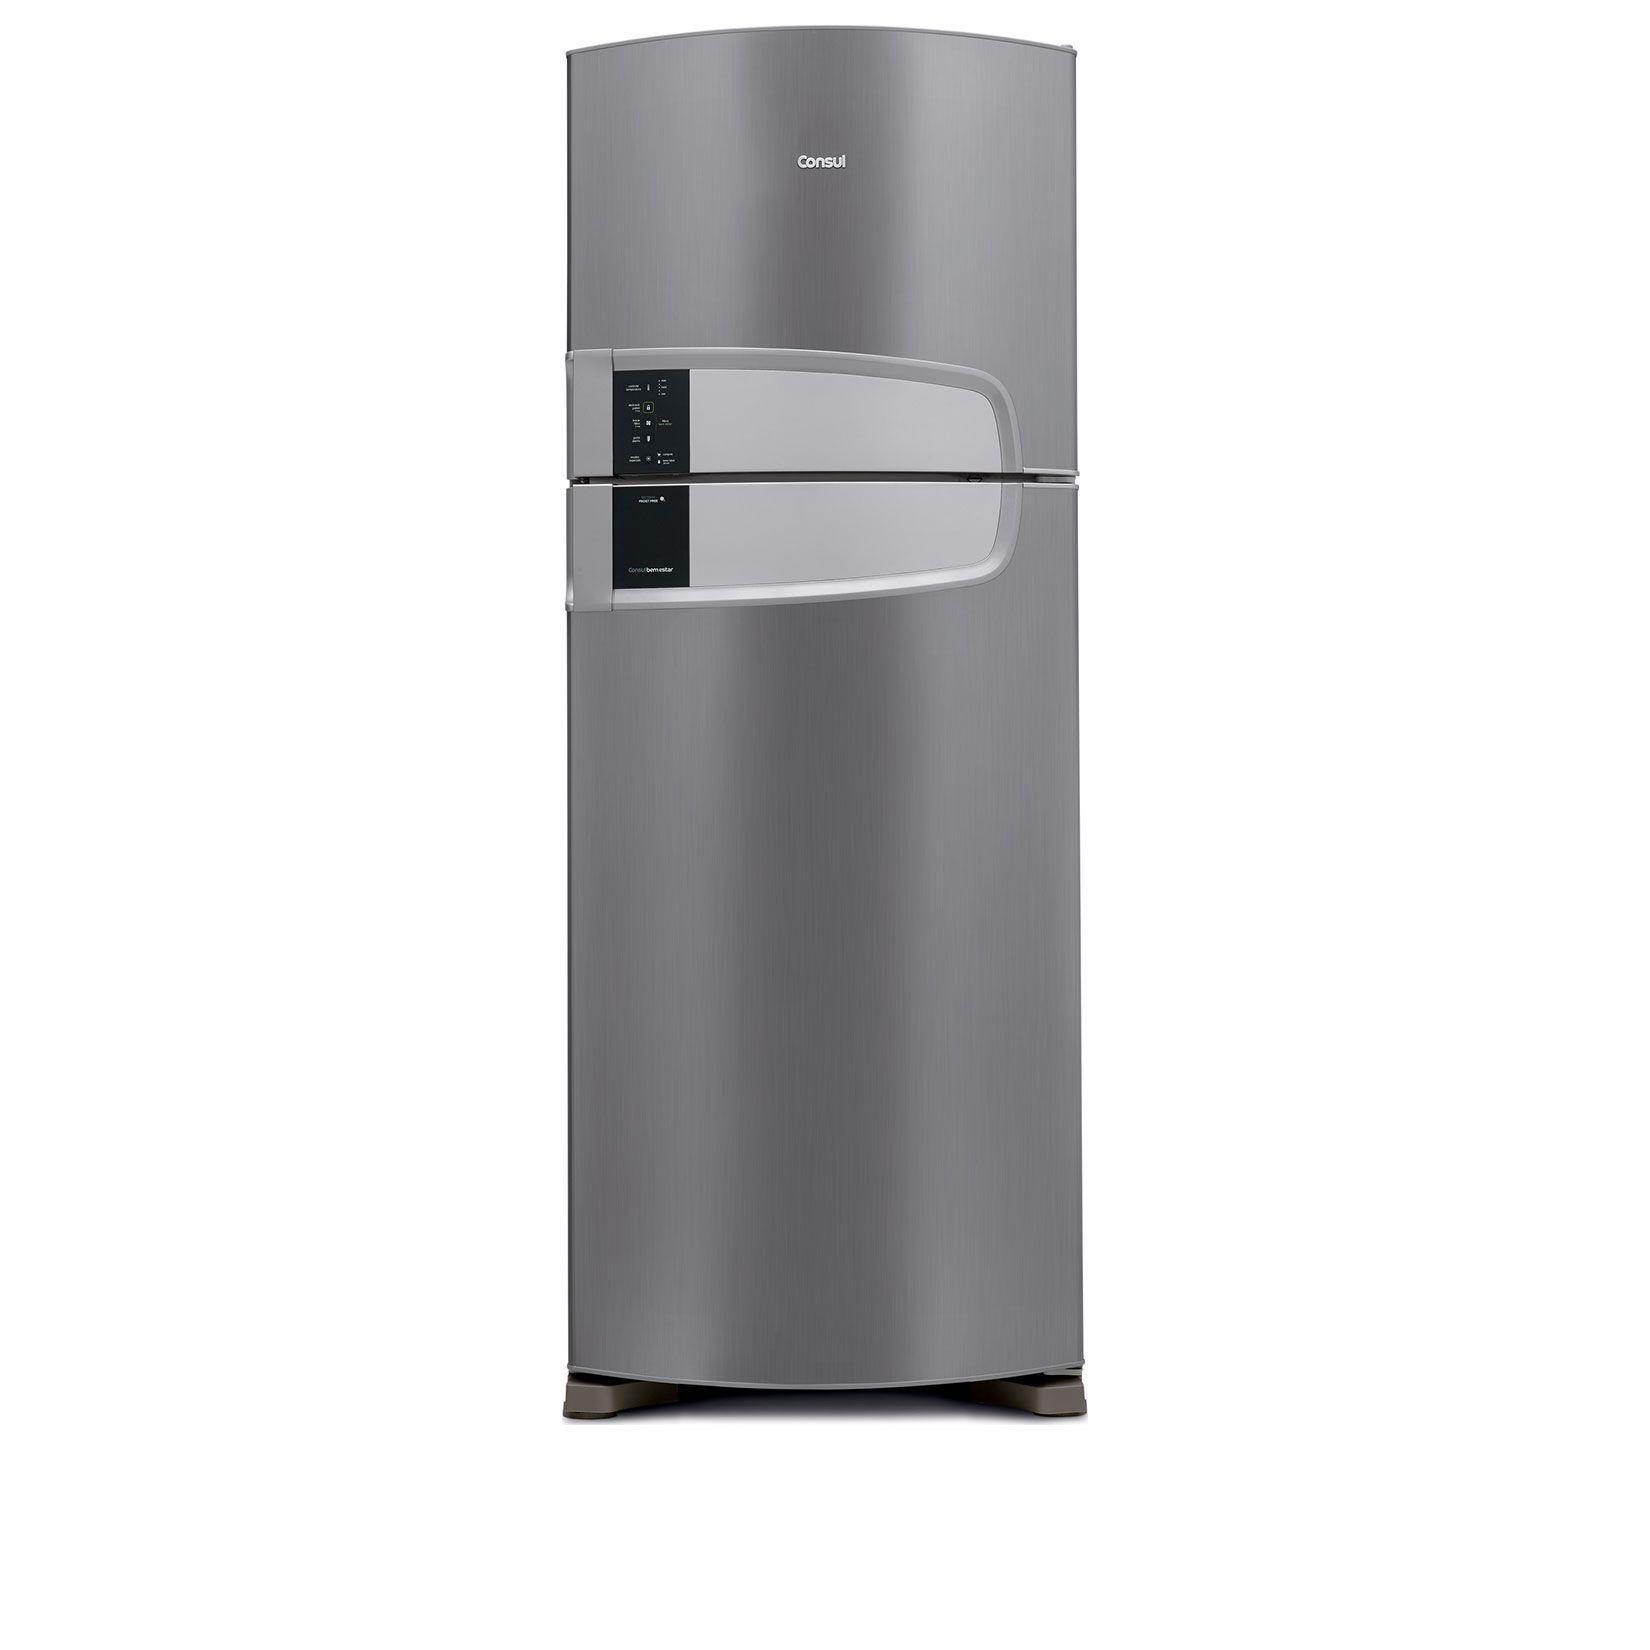 Muitas vezes Geladeira Consul Frost Free Duplex 437 litros cor Inox QB72